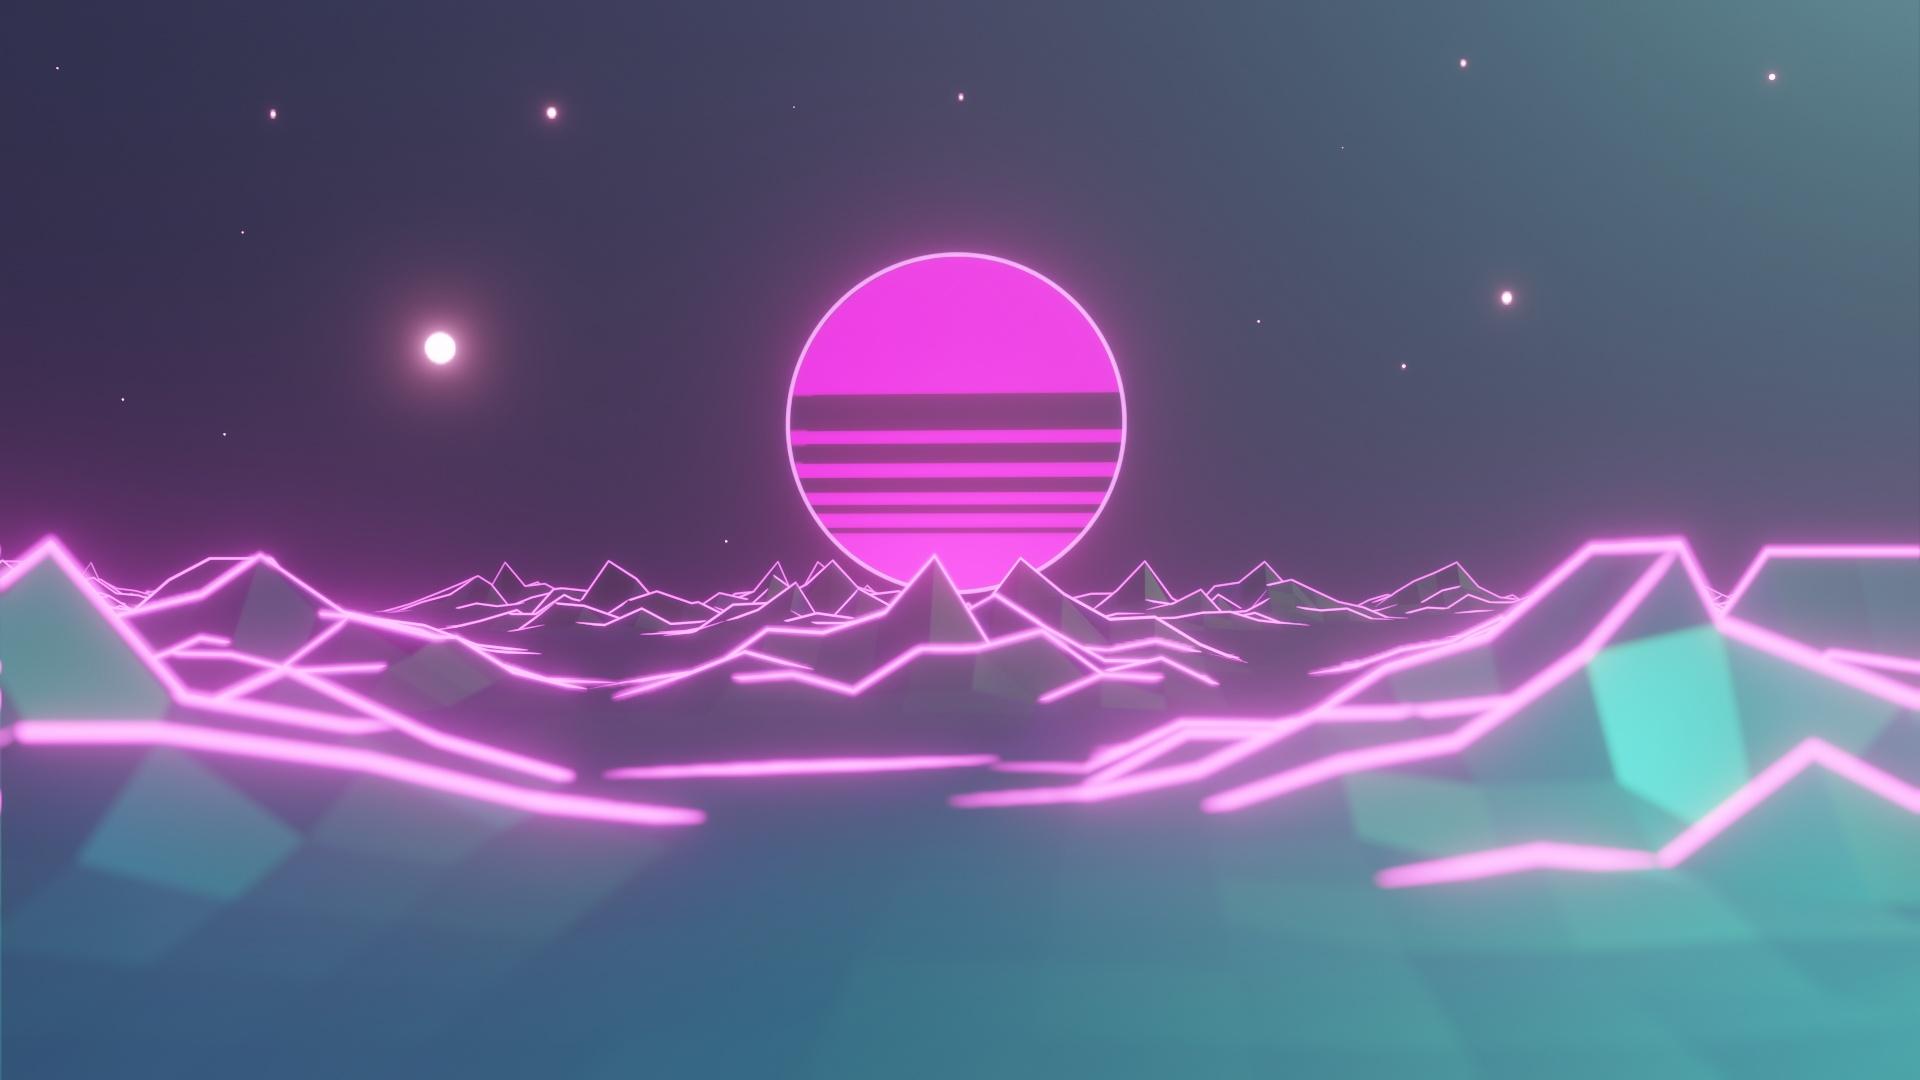 Neon cool wallpaper